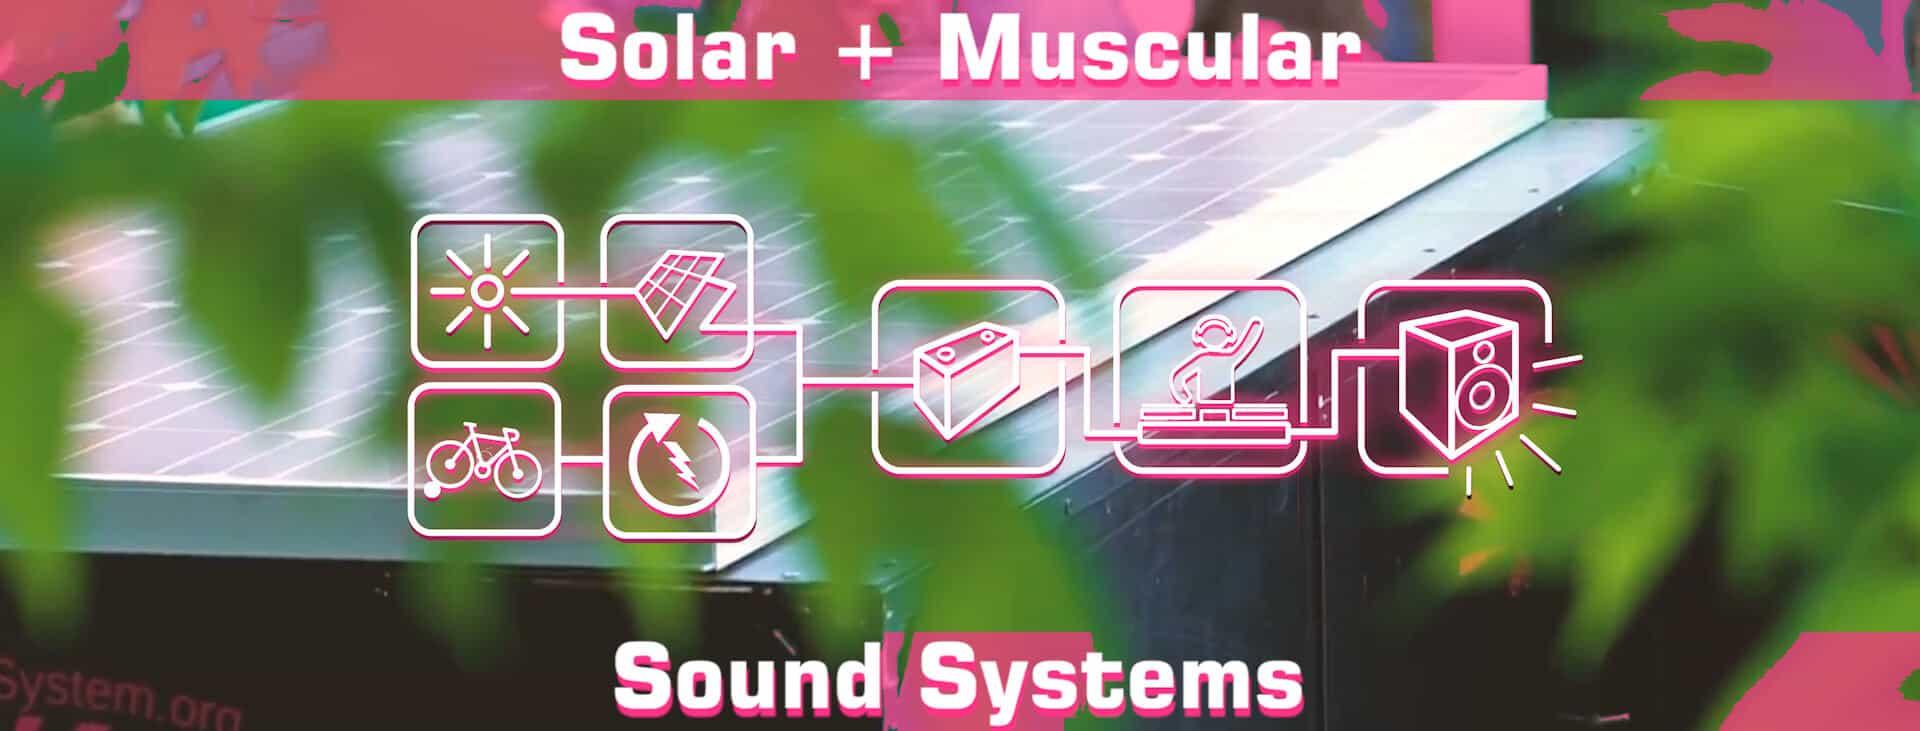 SolarSoundSystem 20 Years